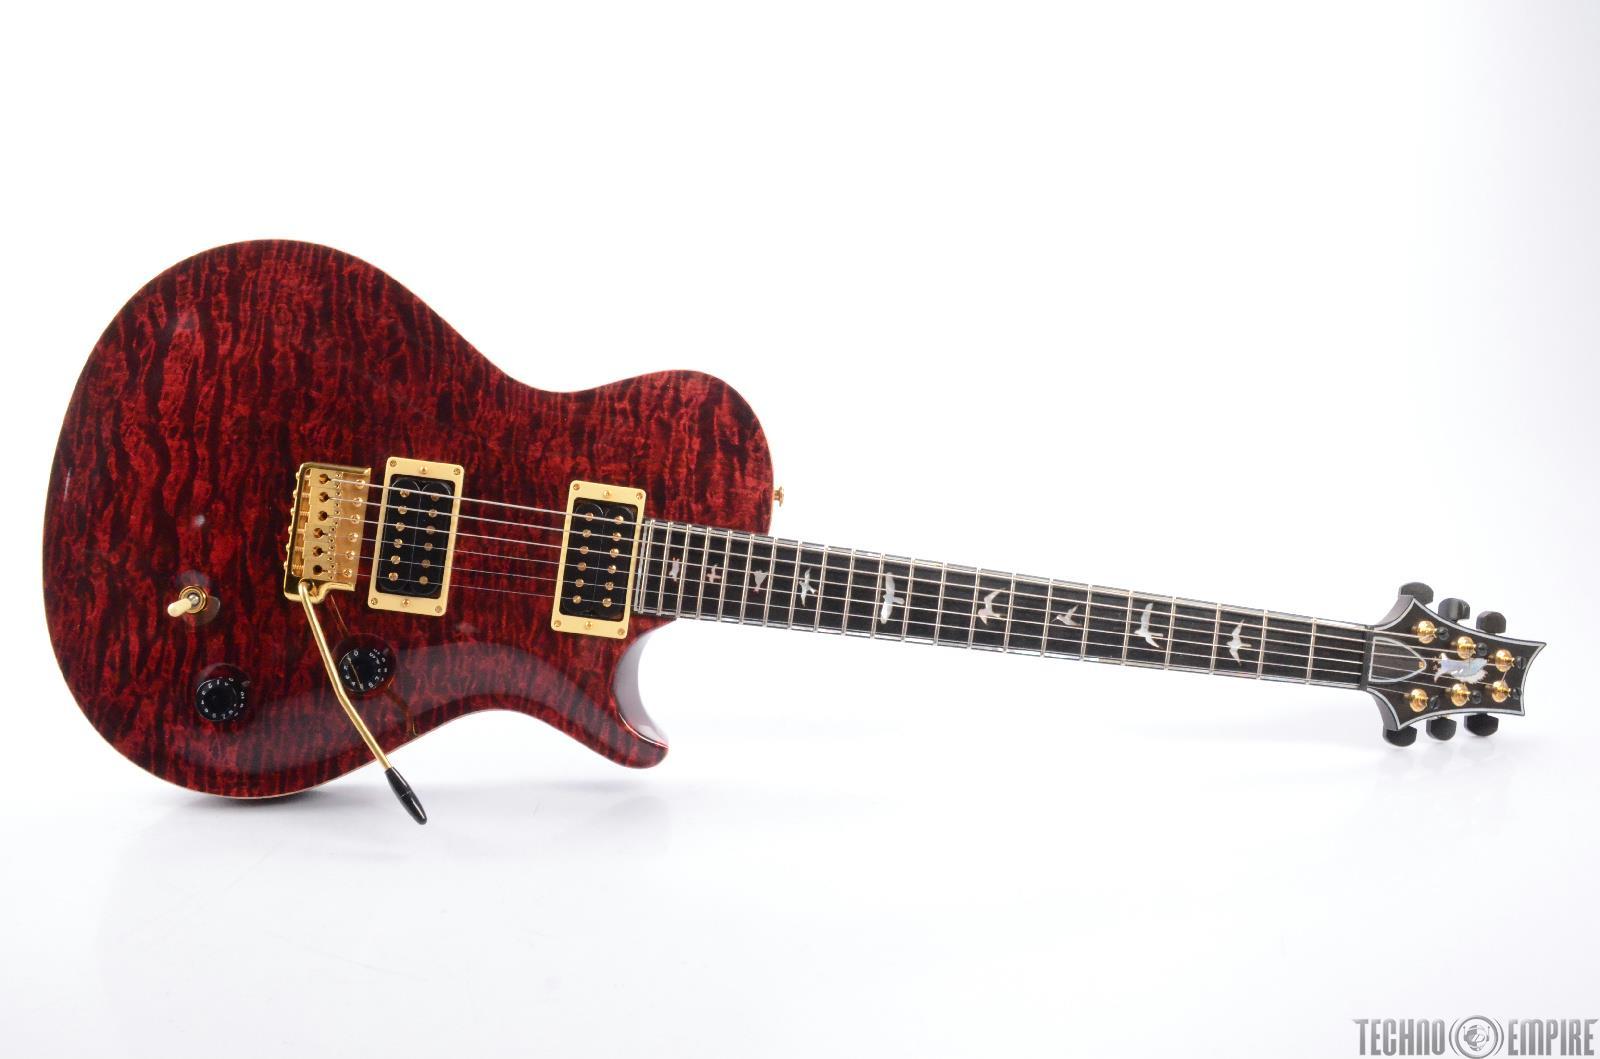 2004 PRS Private Stock #672 SC Single Cut Trem Electric Guitar w/ Case #24279